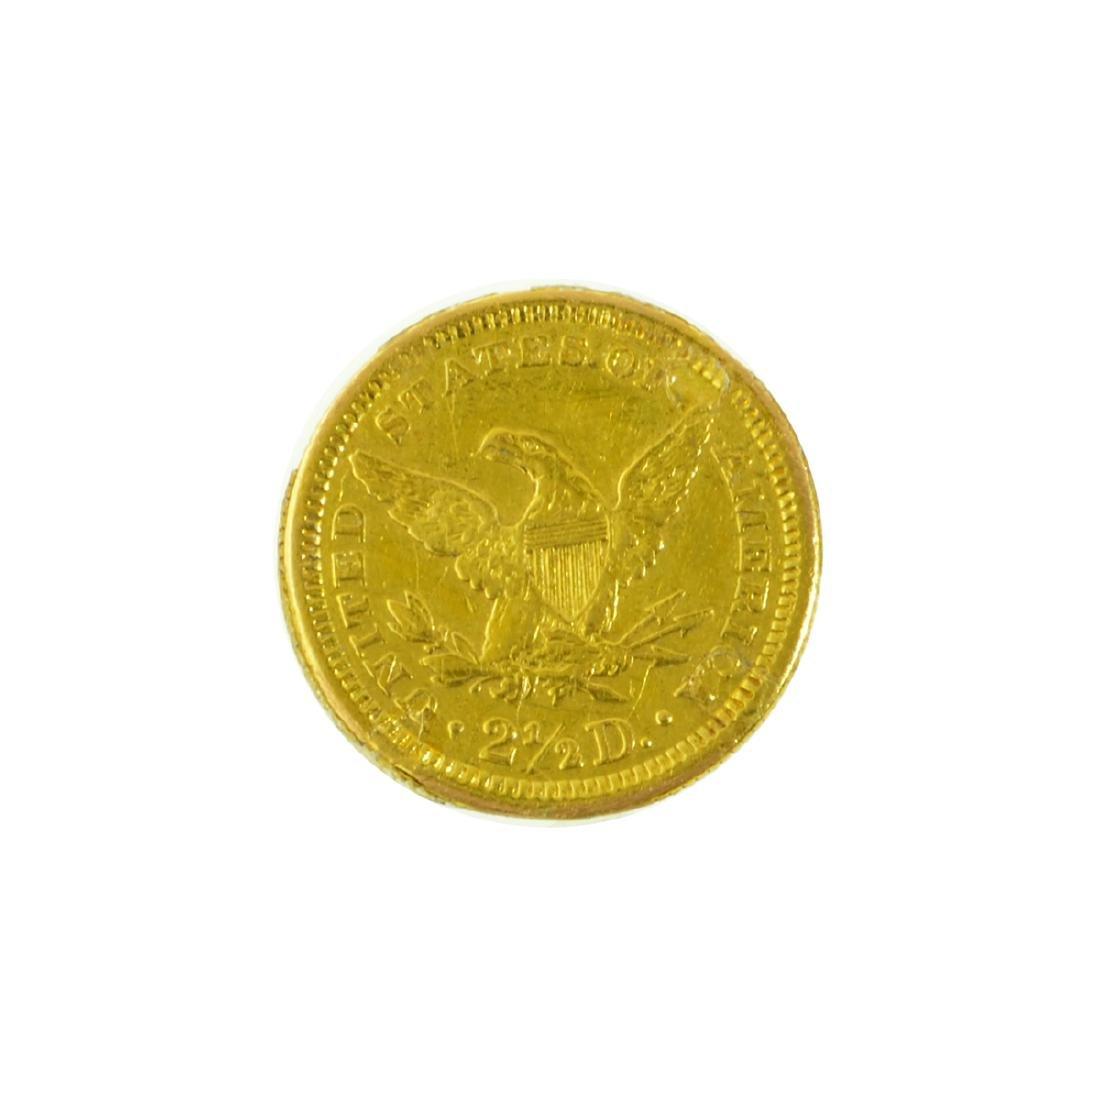 *1861 $2.50 U.S. Liberty Head Gold Coin (JG-MRT) - 2